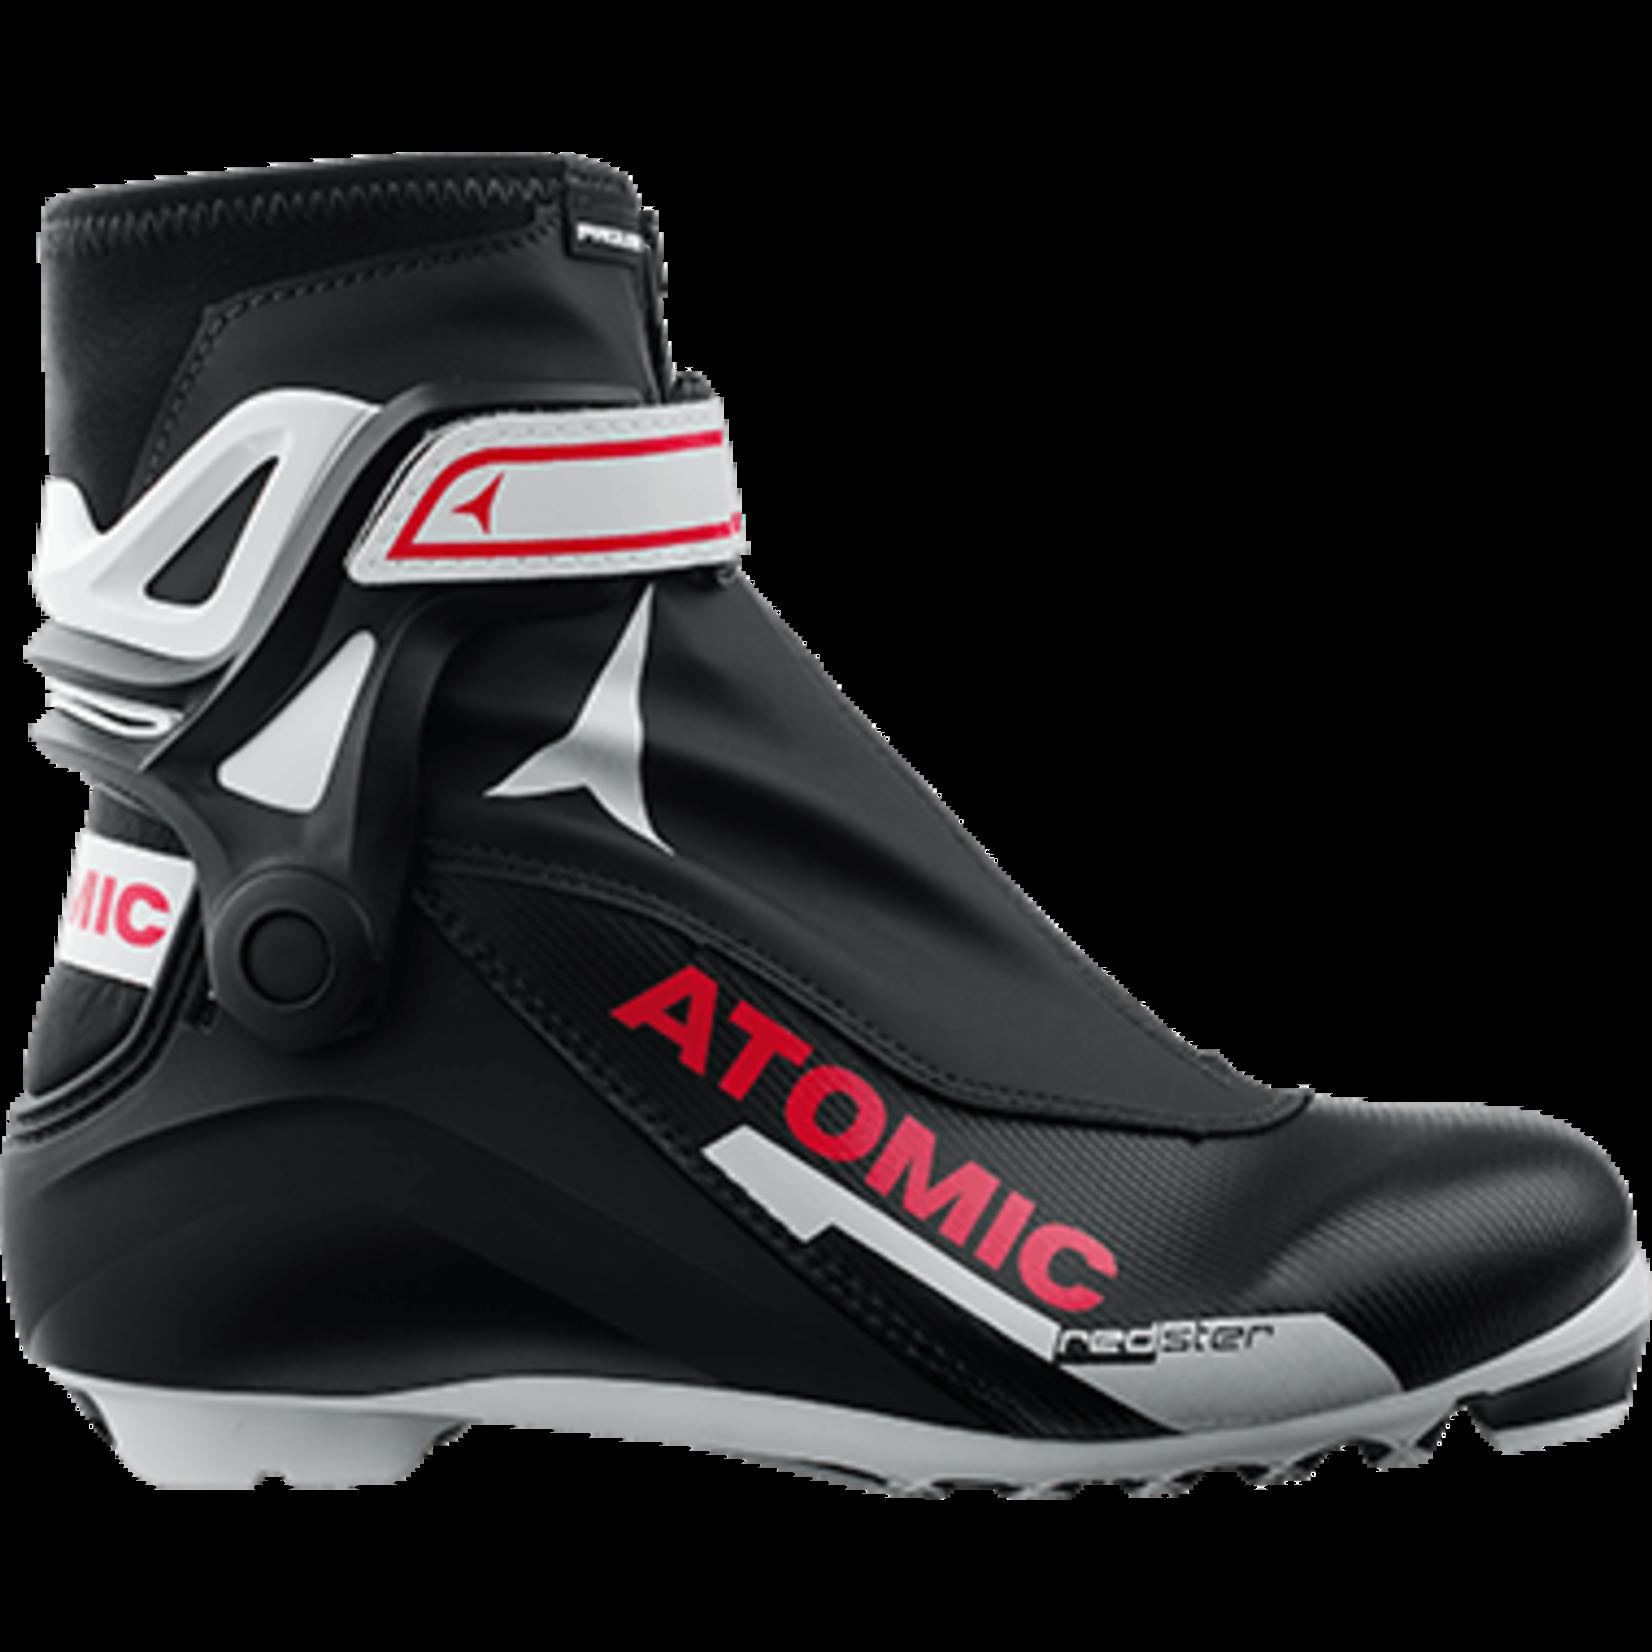 Atomic Atomic Redster Junior WC Pursuit Boot